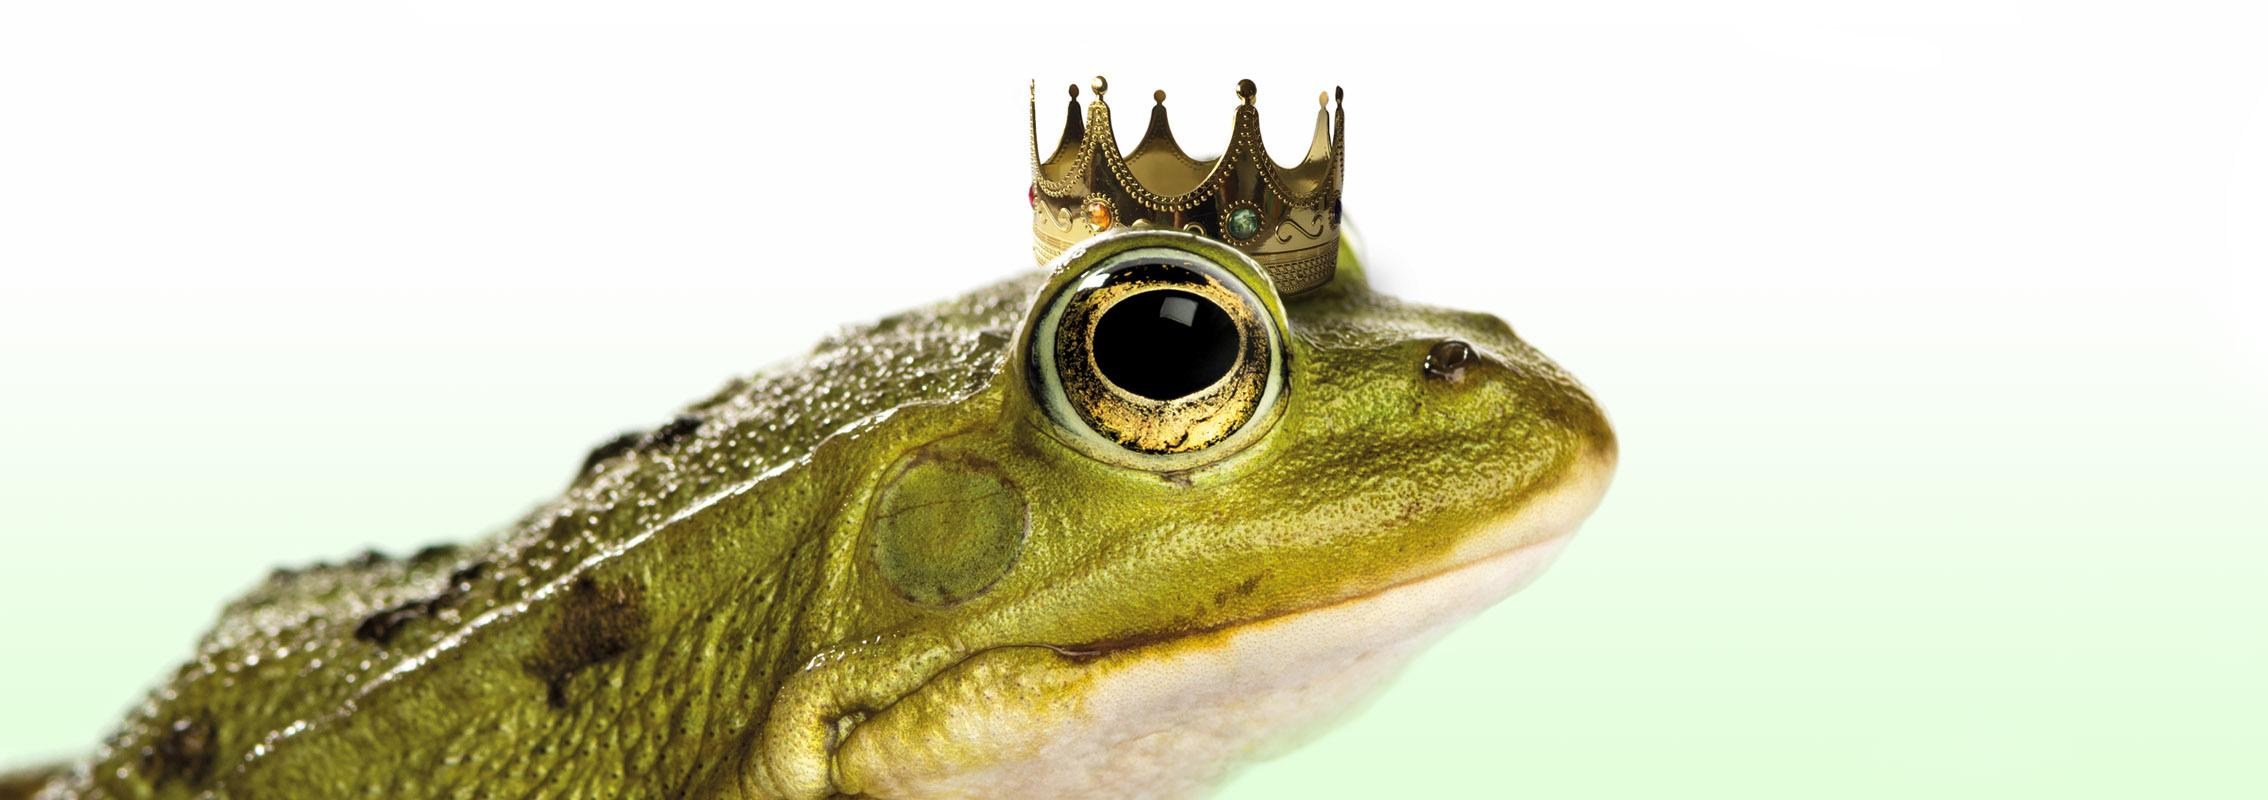 frog-king agentur motiv froschkoenig